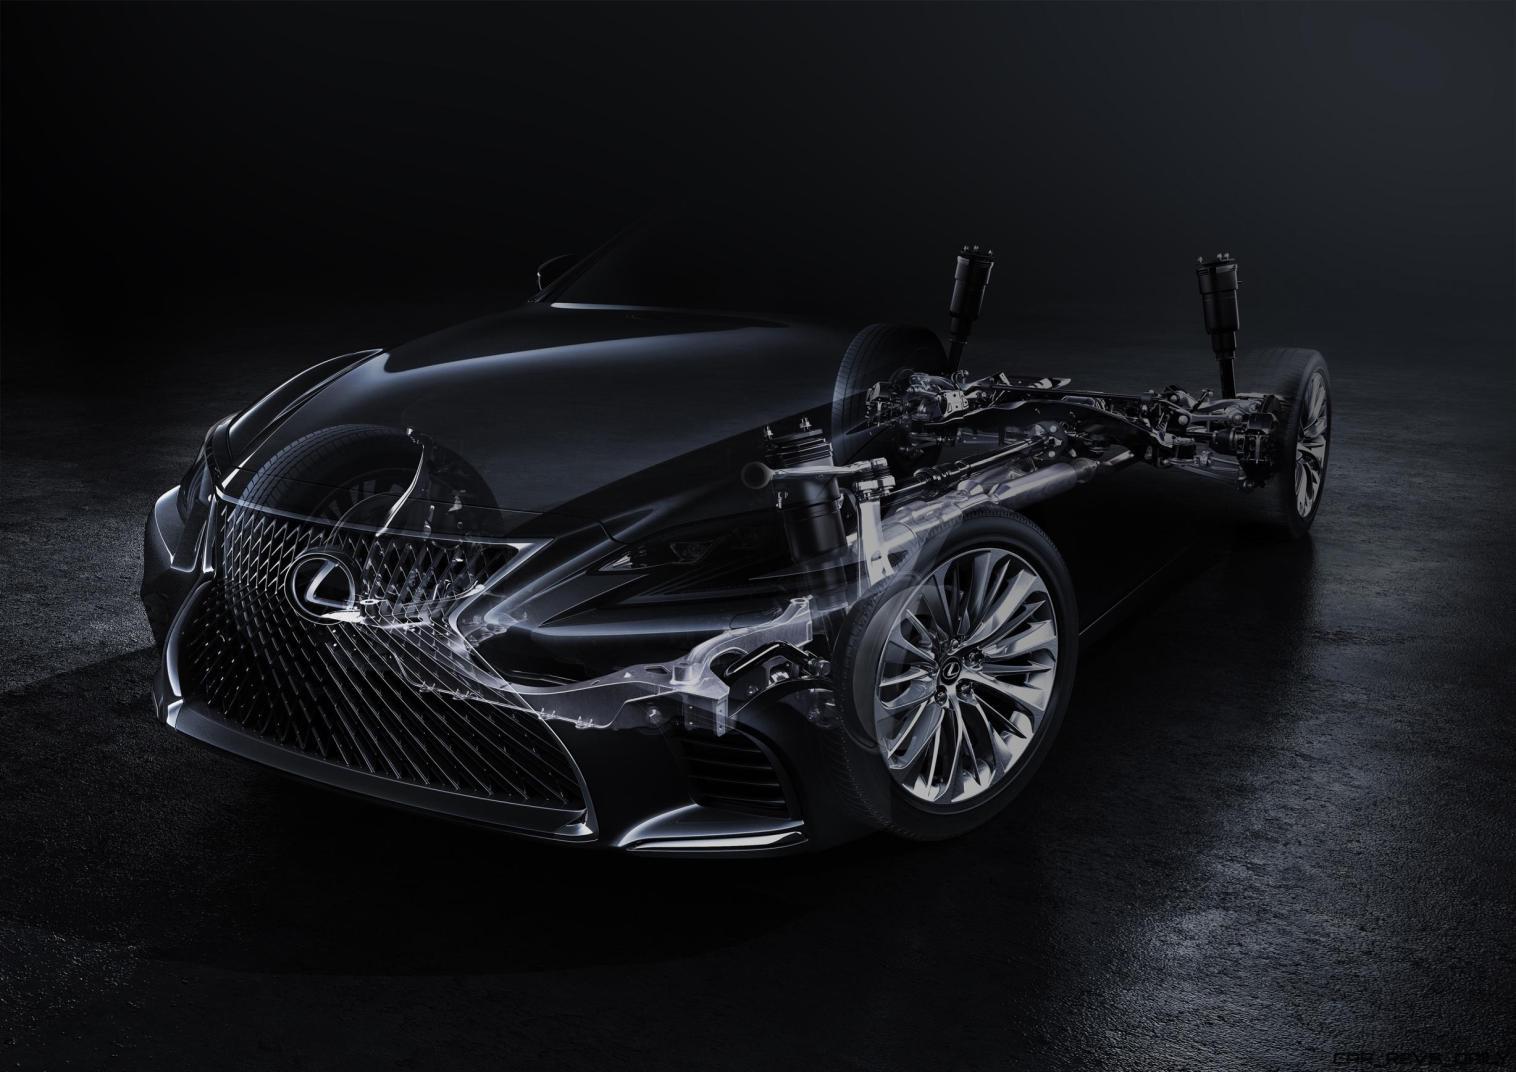 Lexus_2017_NAIAS_Teaser_F08D865EA6BF1A5CE6D78D438C205C9D0B4A51A1